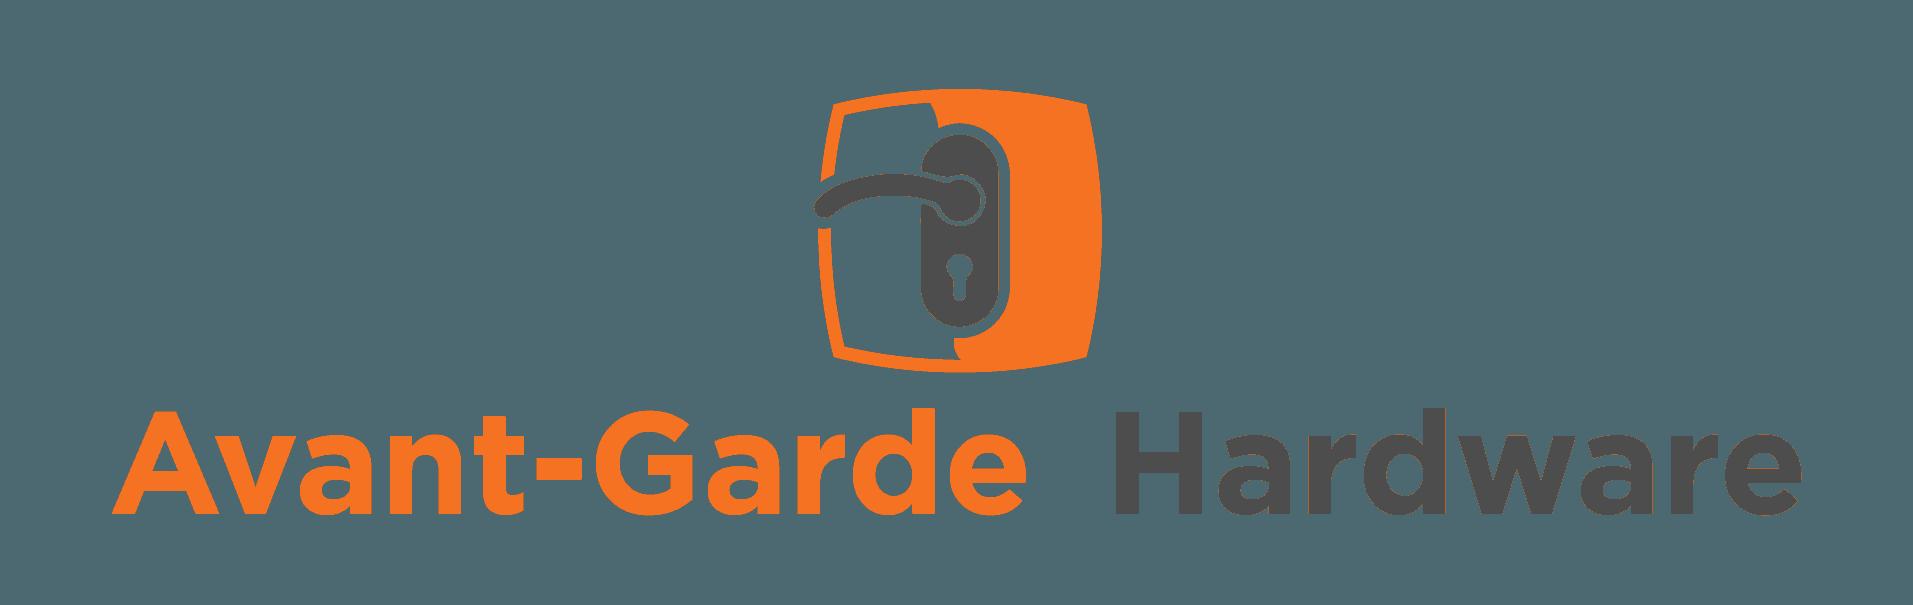 Avant-Garde Hardware, a Top Door Handle Supplier in Sydney Announces Australia Wide Delivery